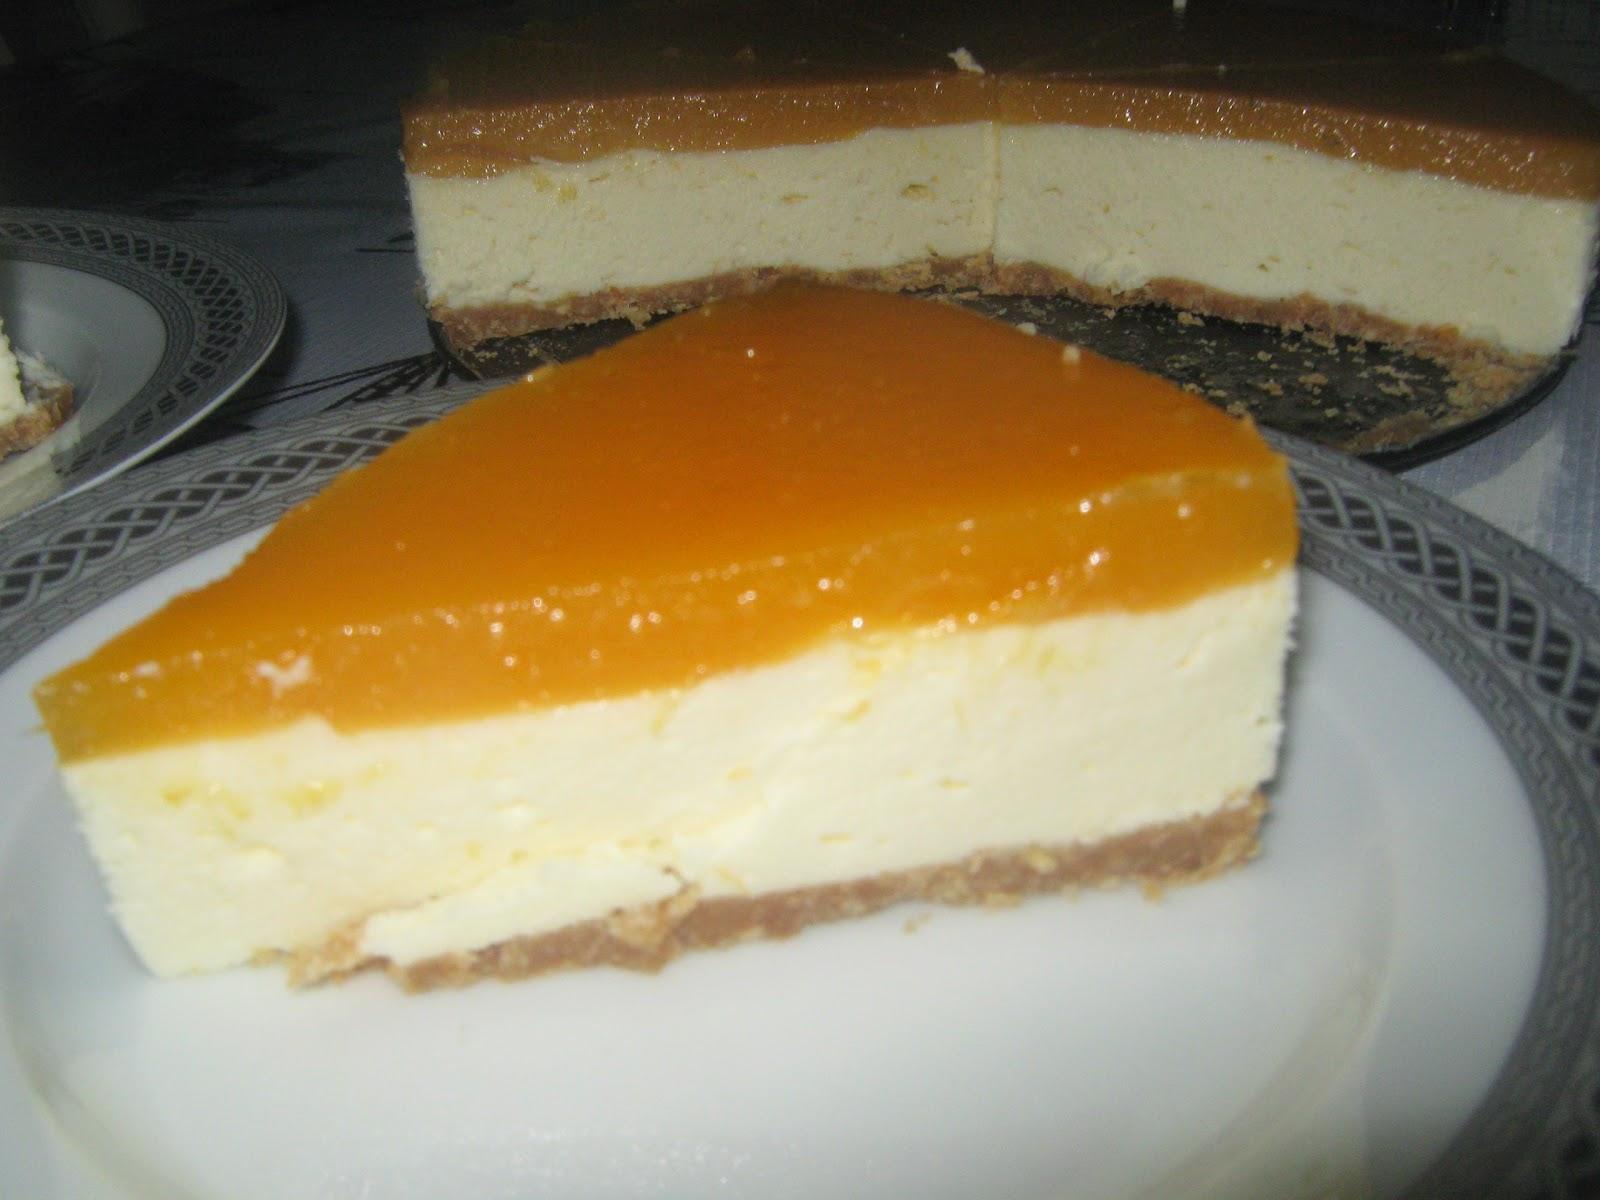 cheesecake,pratik chhesecake,dr oetker cheesecake,cheesecake yap,şeftalili cheesecake